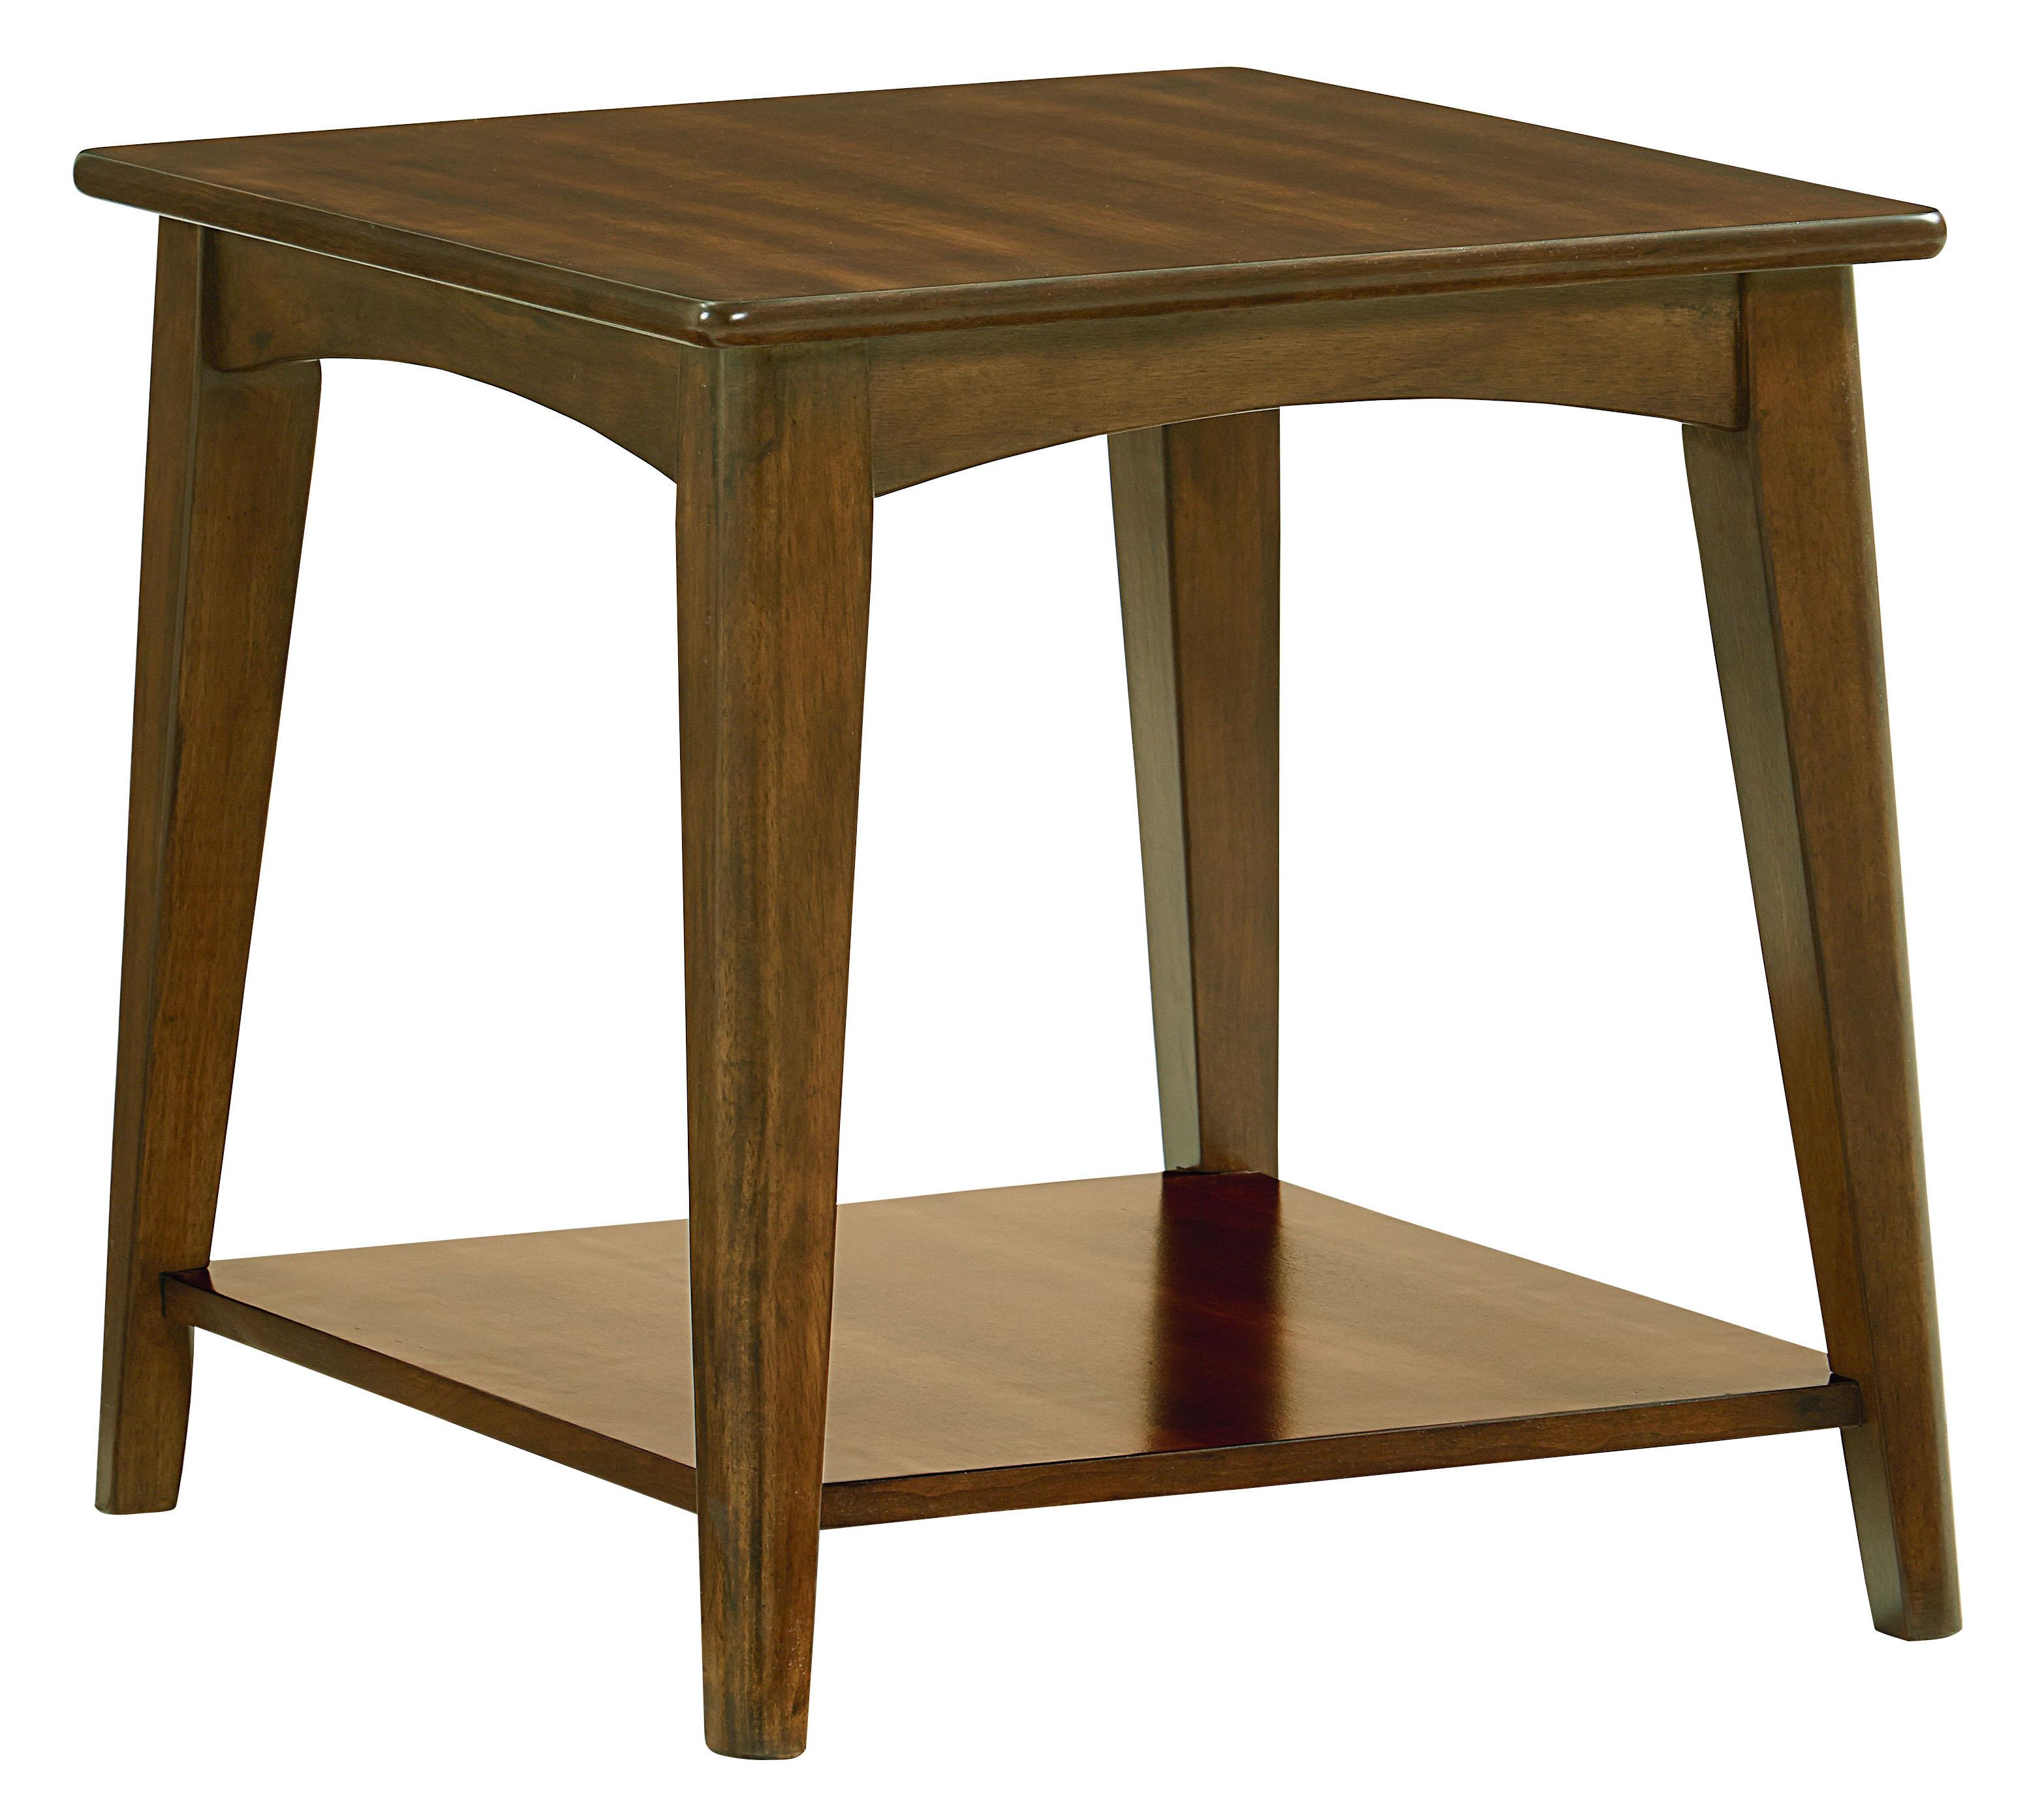 Standard Furniture Roxbury End Table - Item Number: 28485